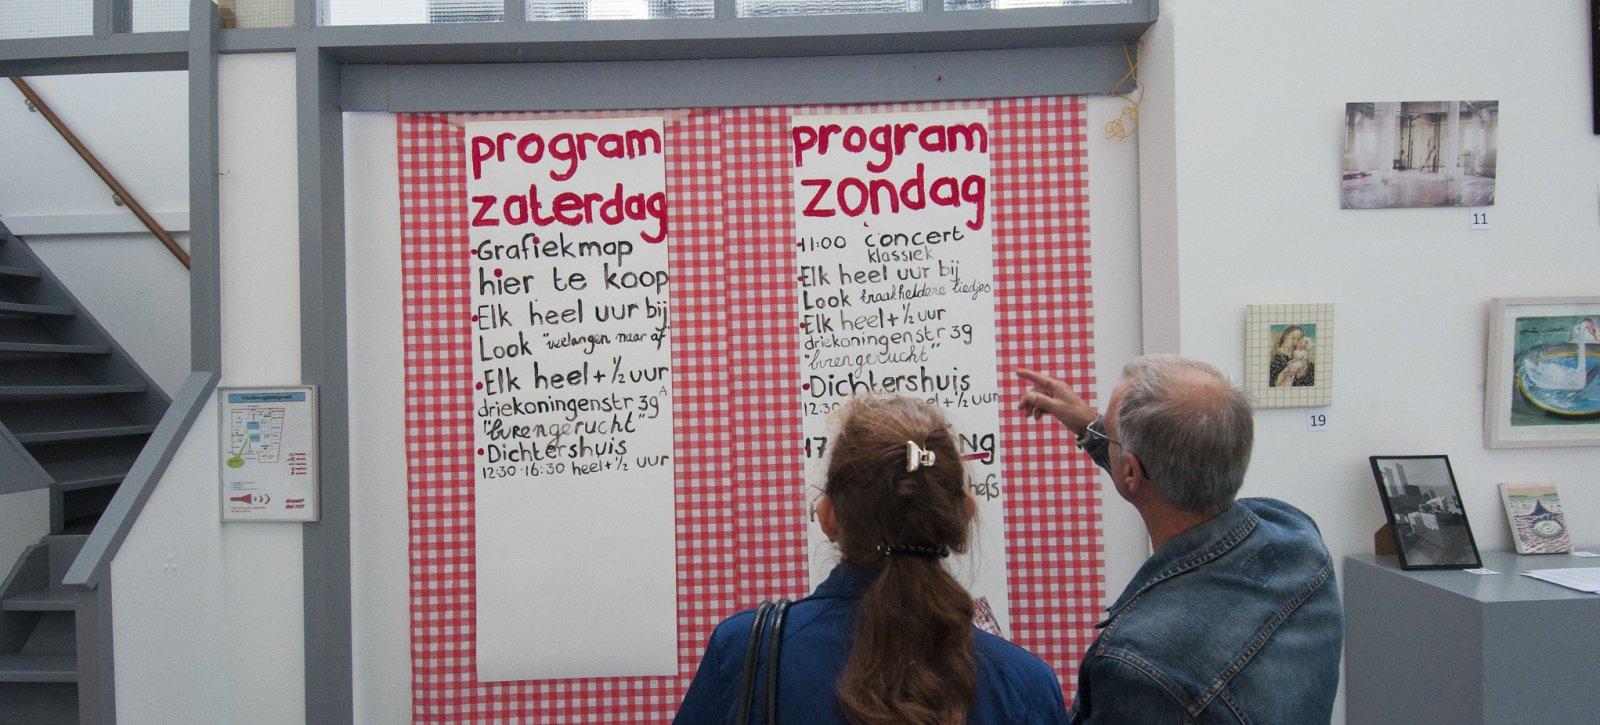 Programma (foto: Erik Vos)